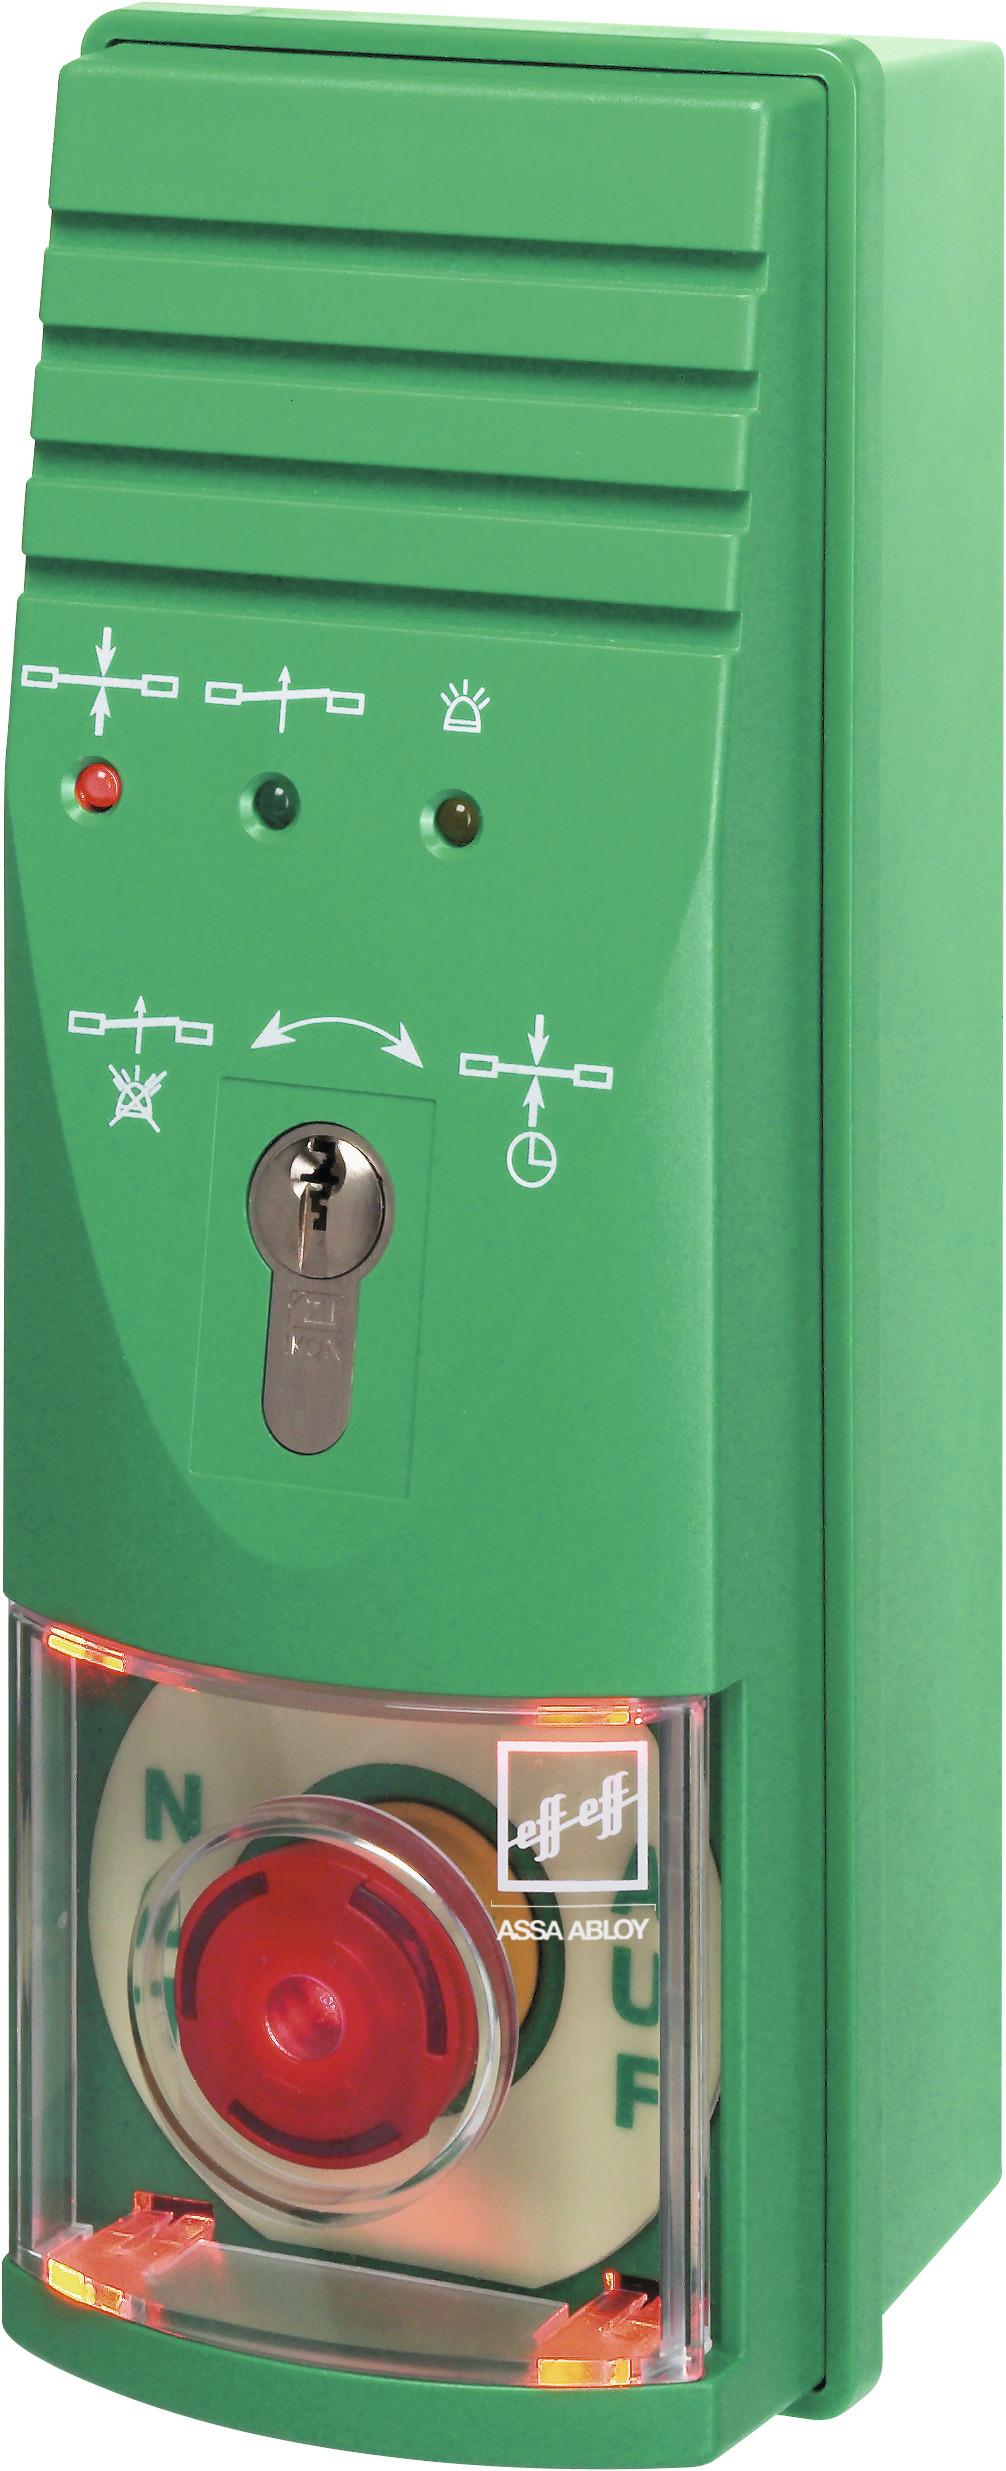 Escape Door Control Unit Terminal Surface Mounted A Abloy Wiring Diagrams Model 1340 14